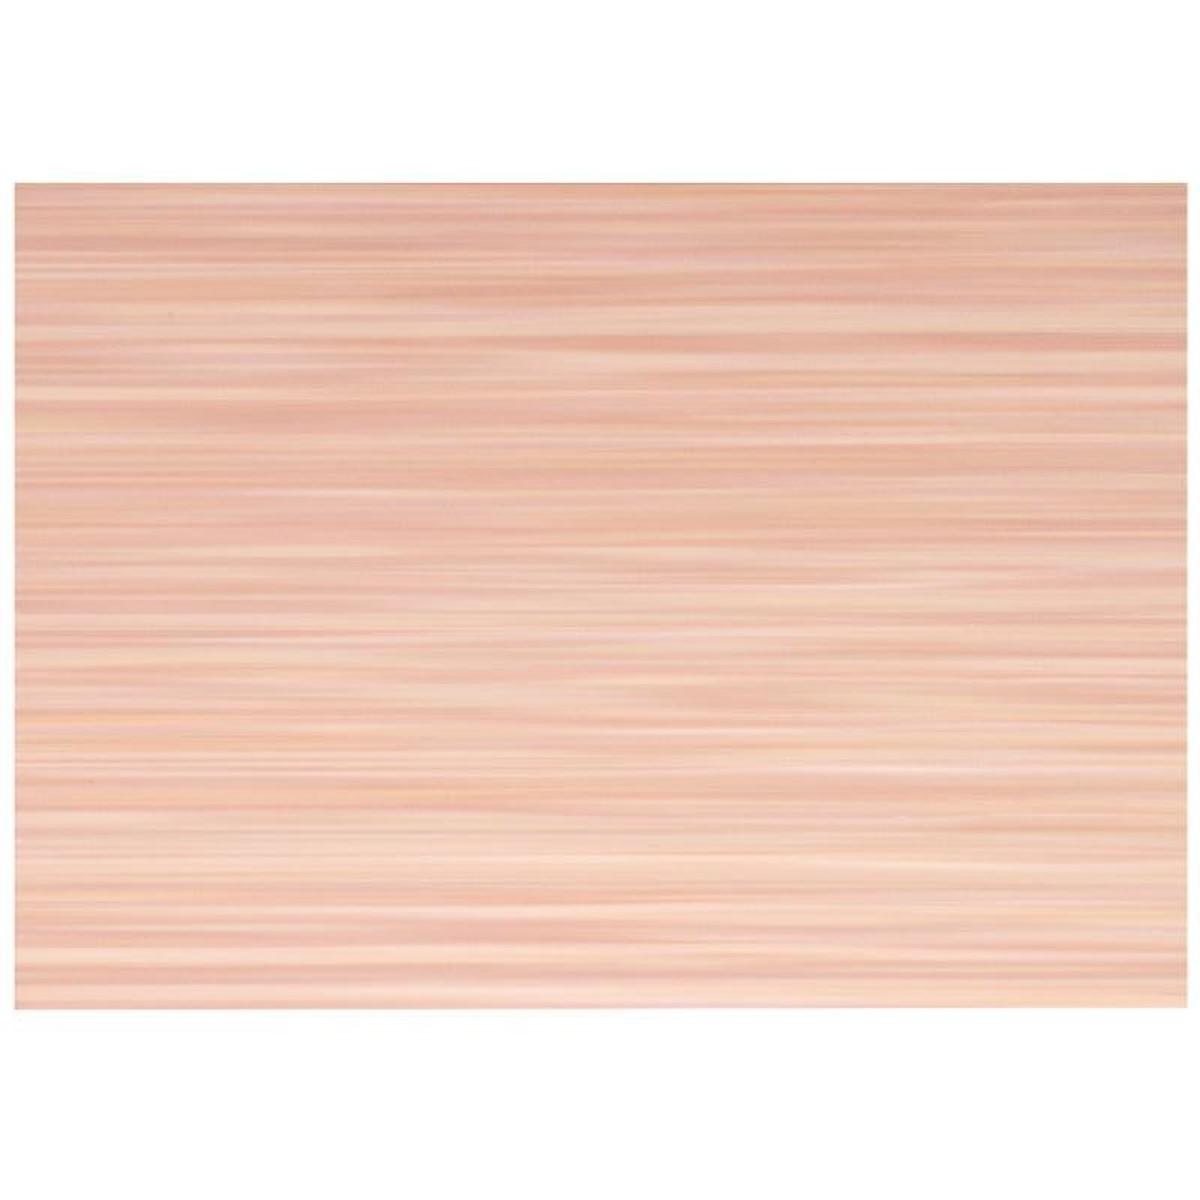 Плитка настенная Арома низ 28х40 см 1.232 м2 цвет розовый